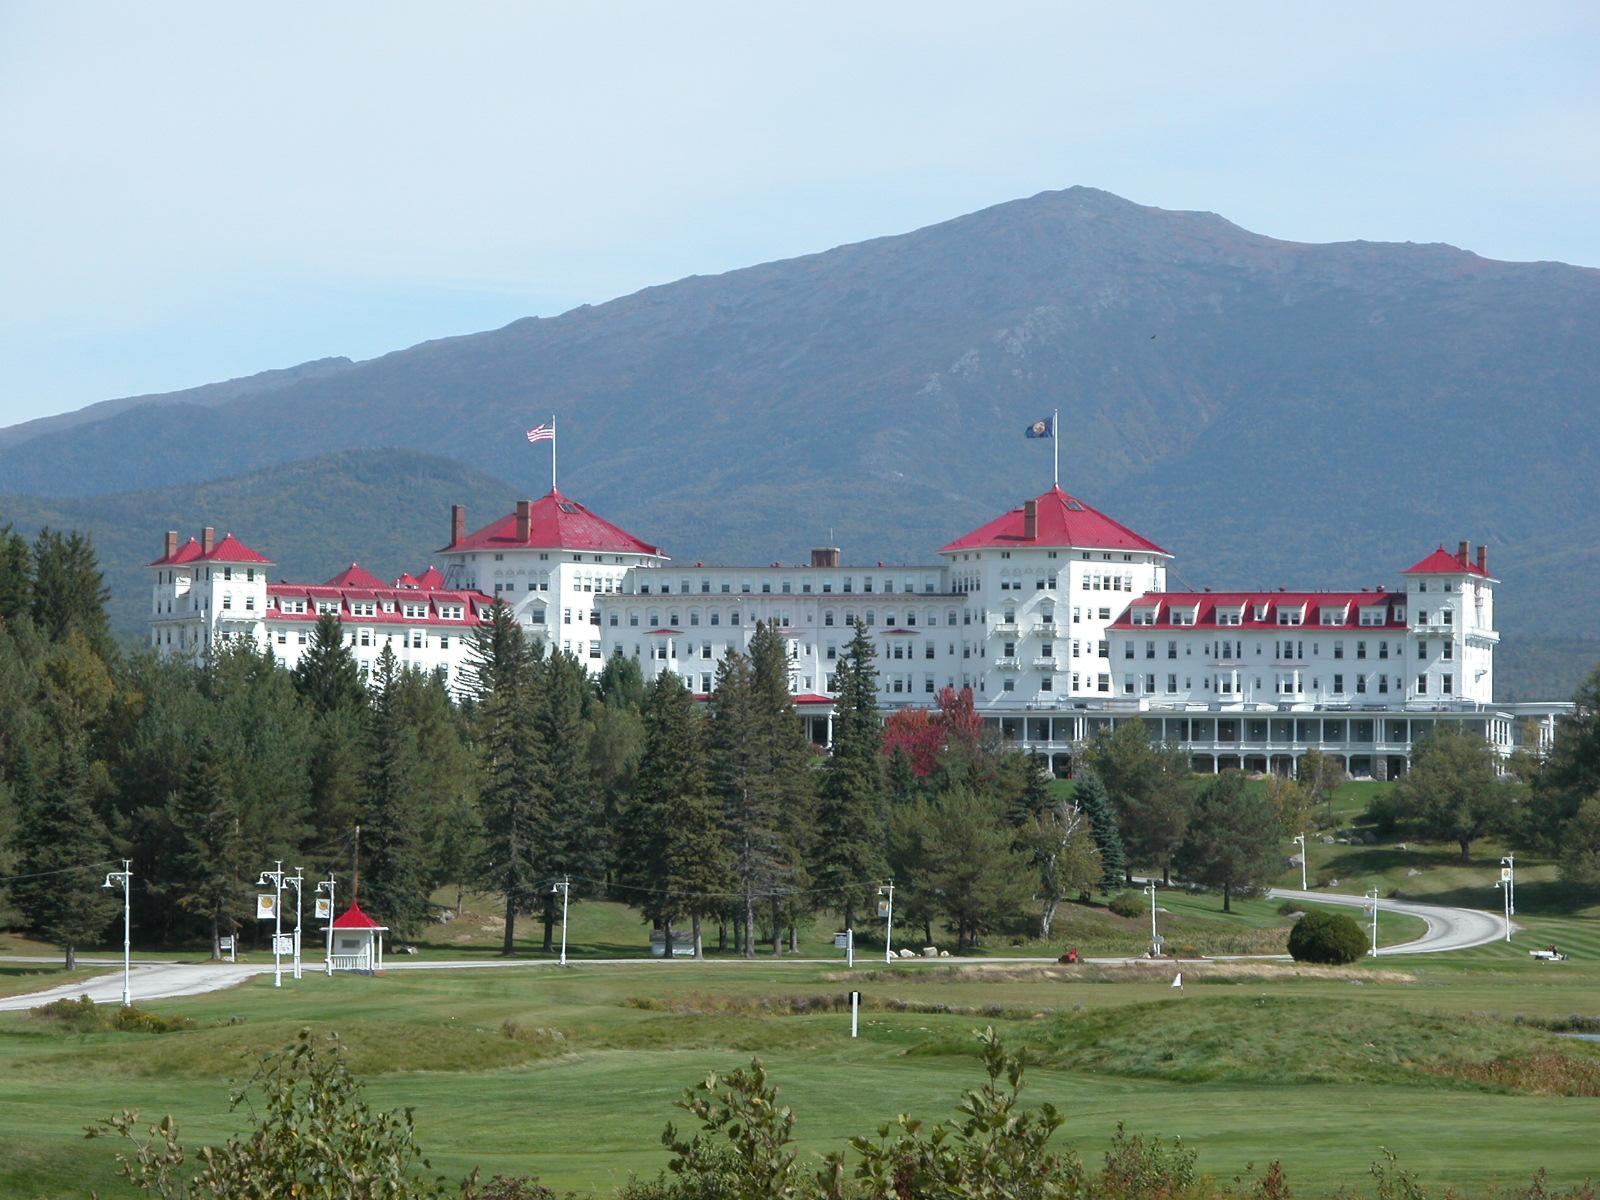 Mount Washington Hotel And Resort